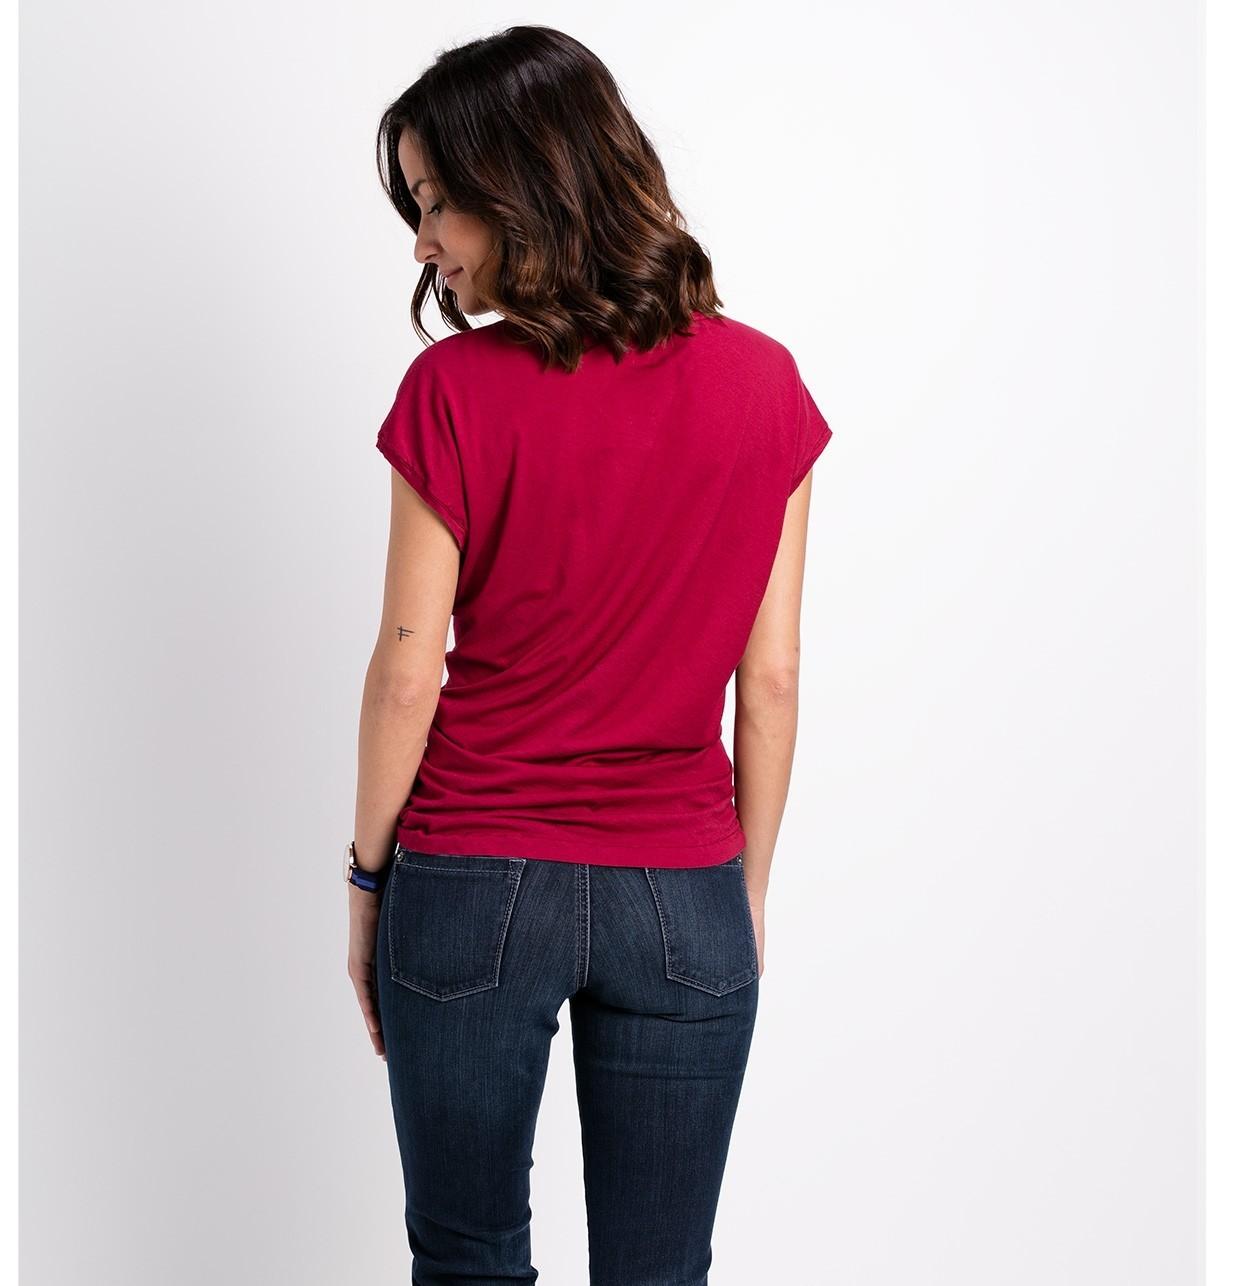 Blusa manga corta modelo TIMOR Doble tela color fresa, 100% algodón - Ítem1